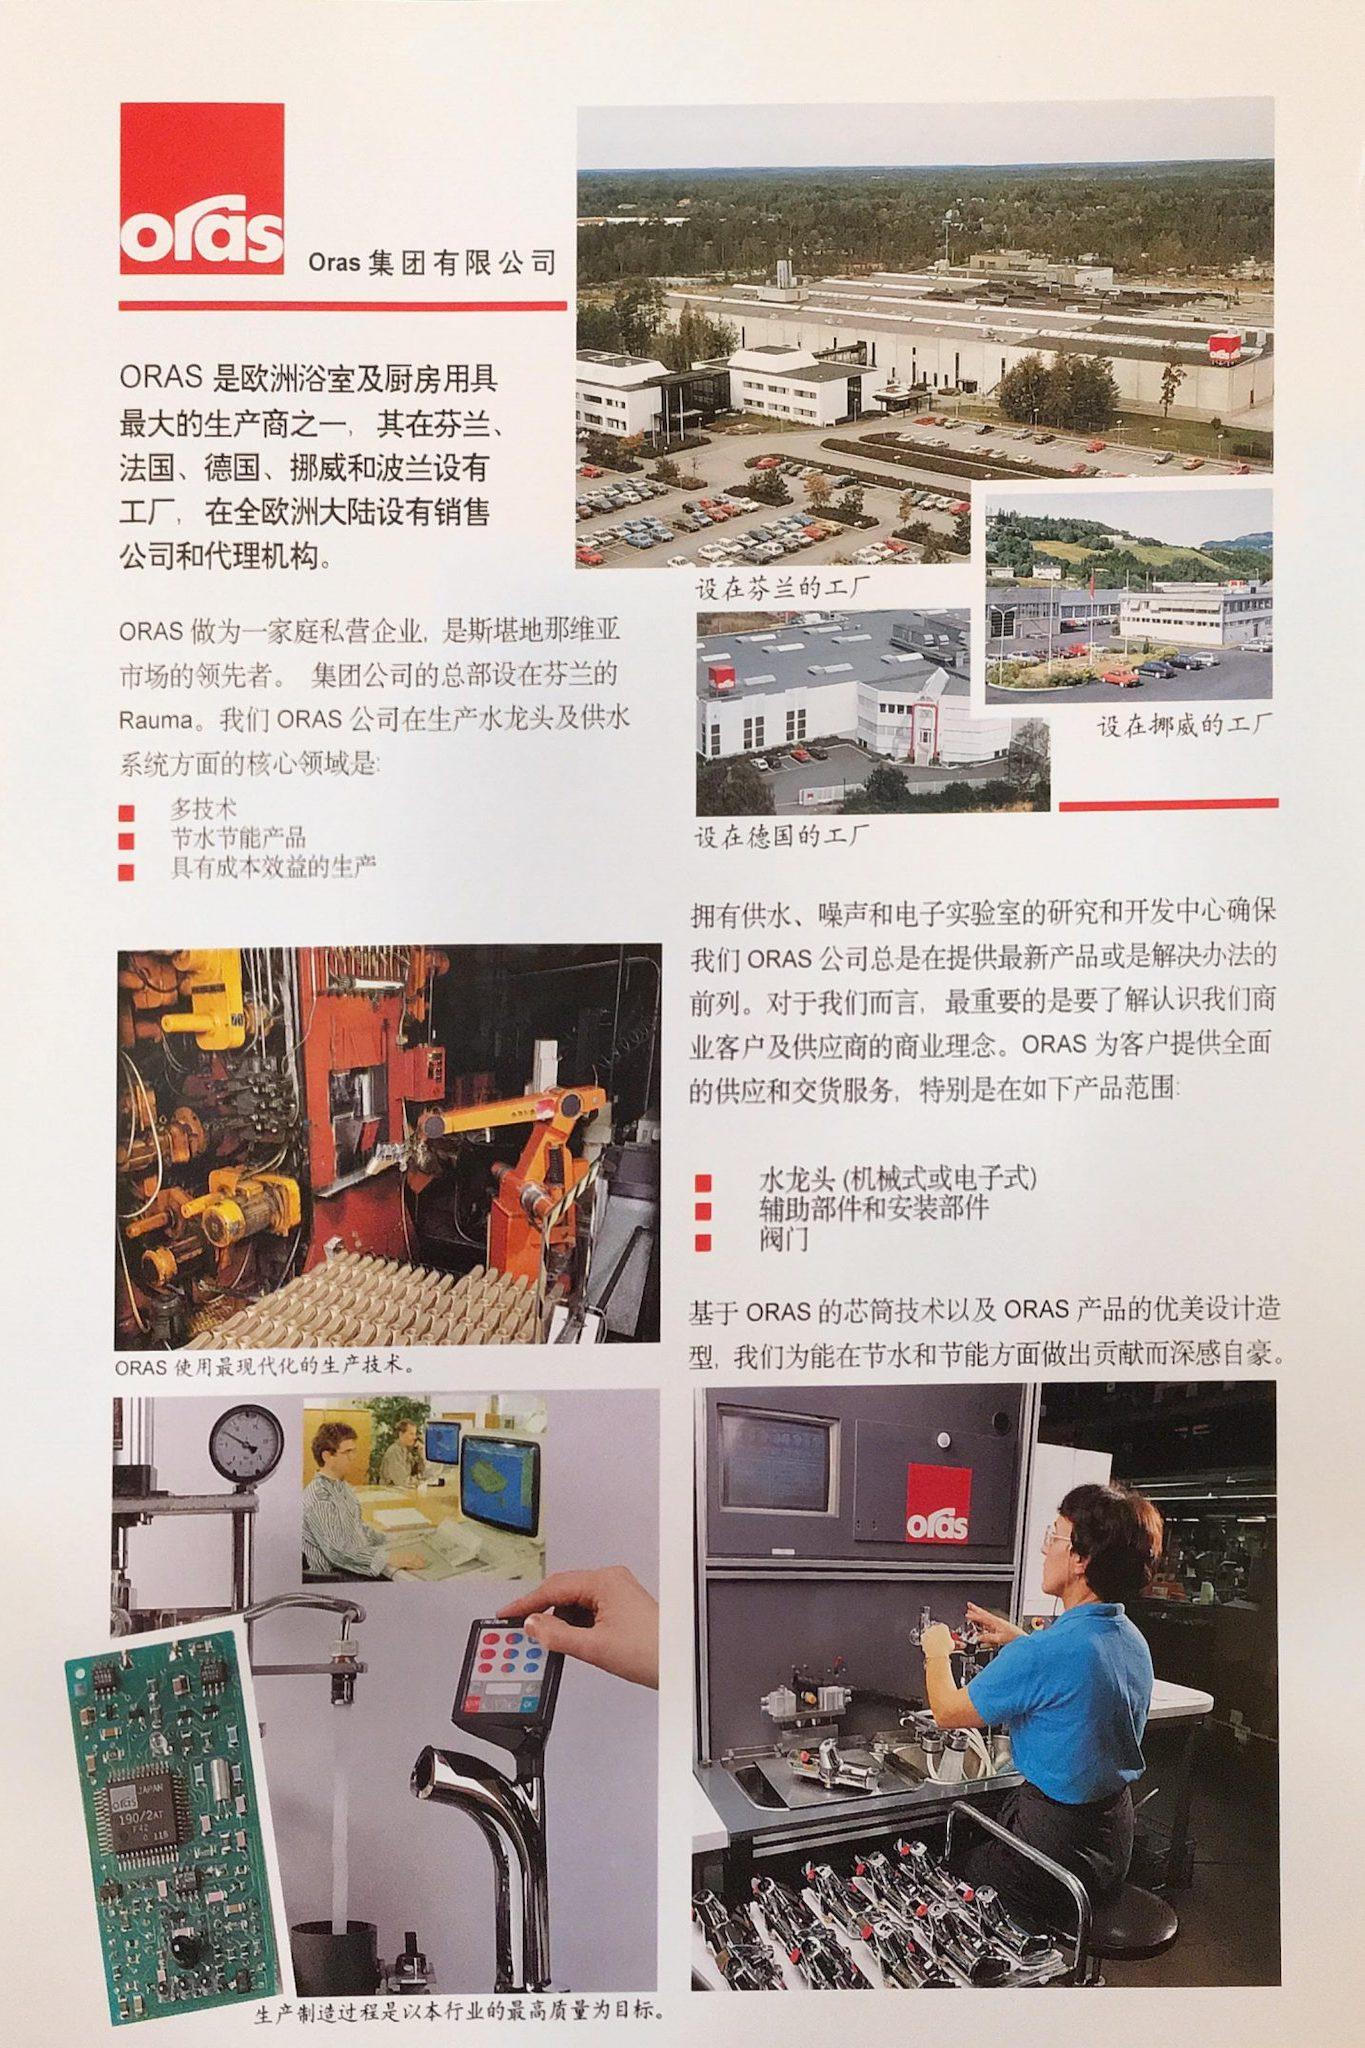 tekway-company-leaflets-brochures-oras-e1585129892975-1434x2048